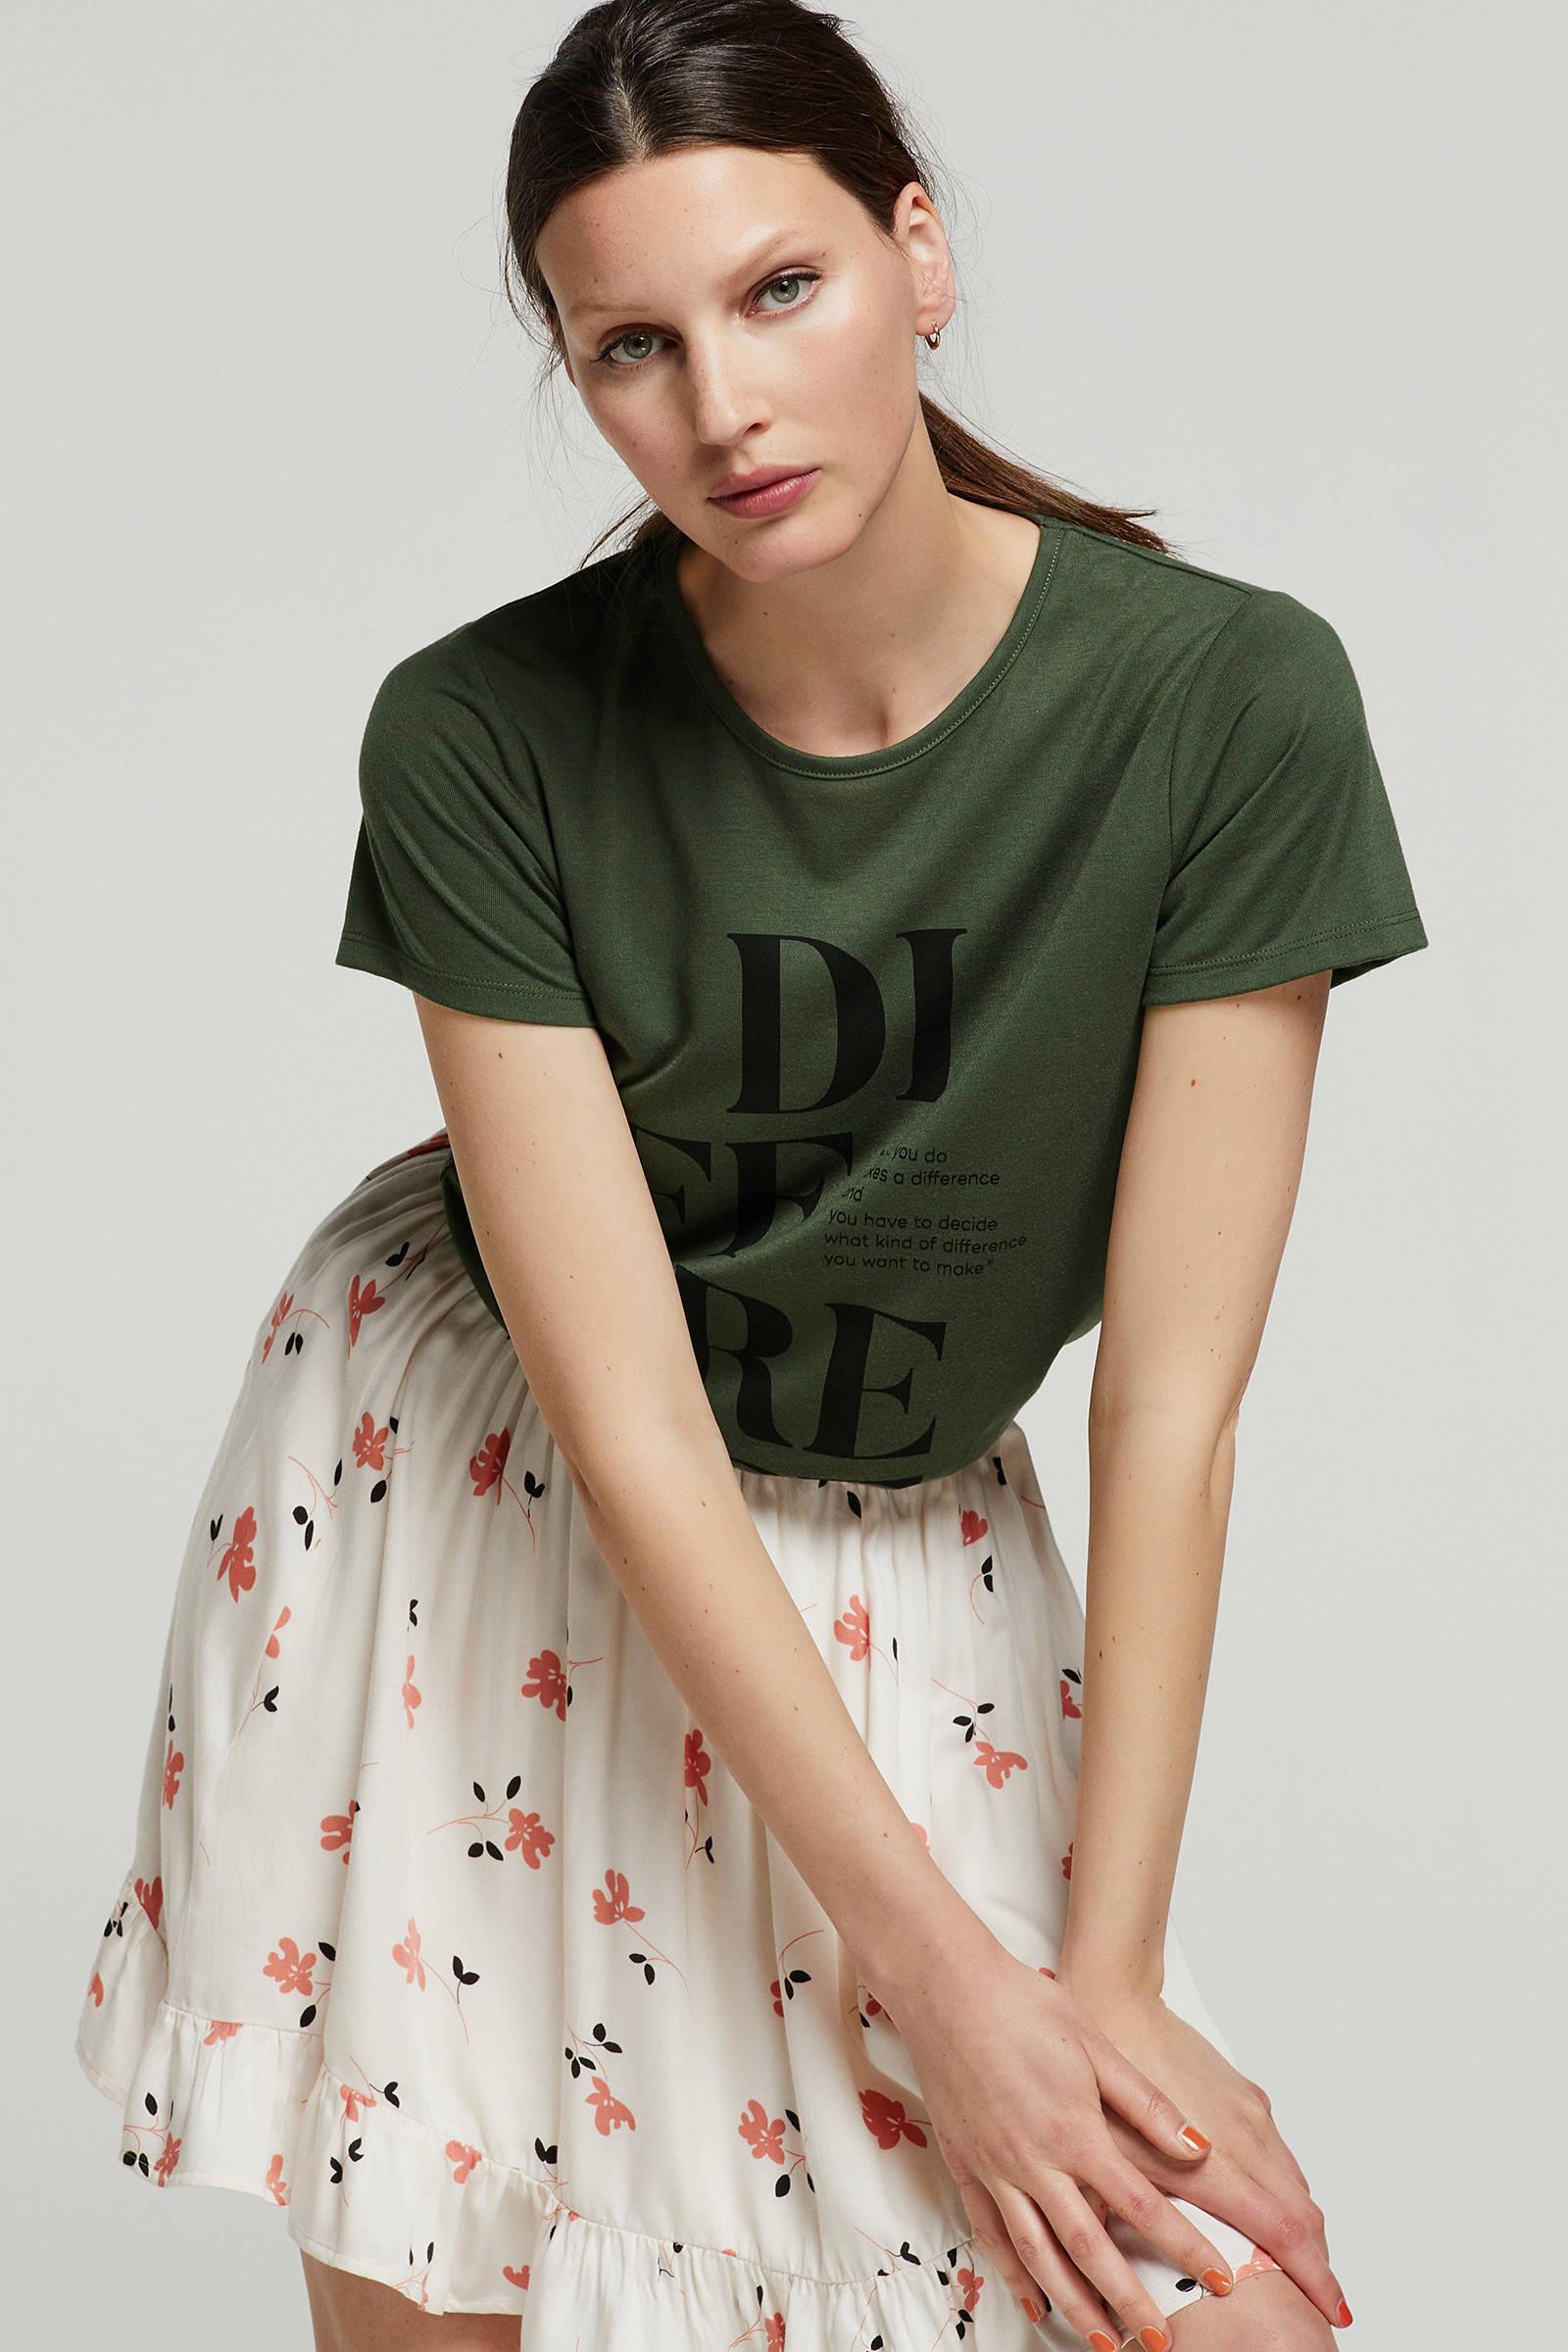 Wehkamp Jane Goodall Save The Planet T-shirt bZngtgpo